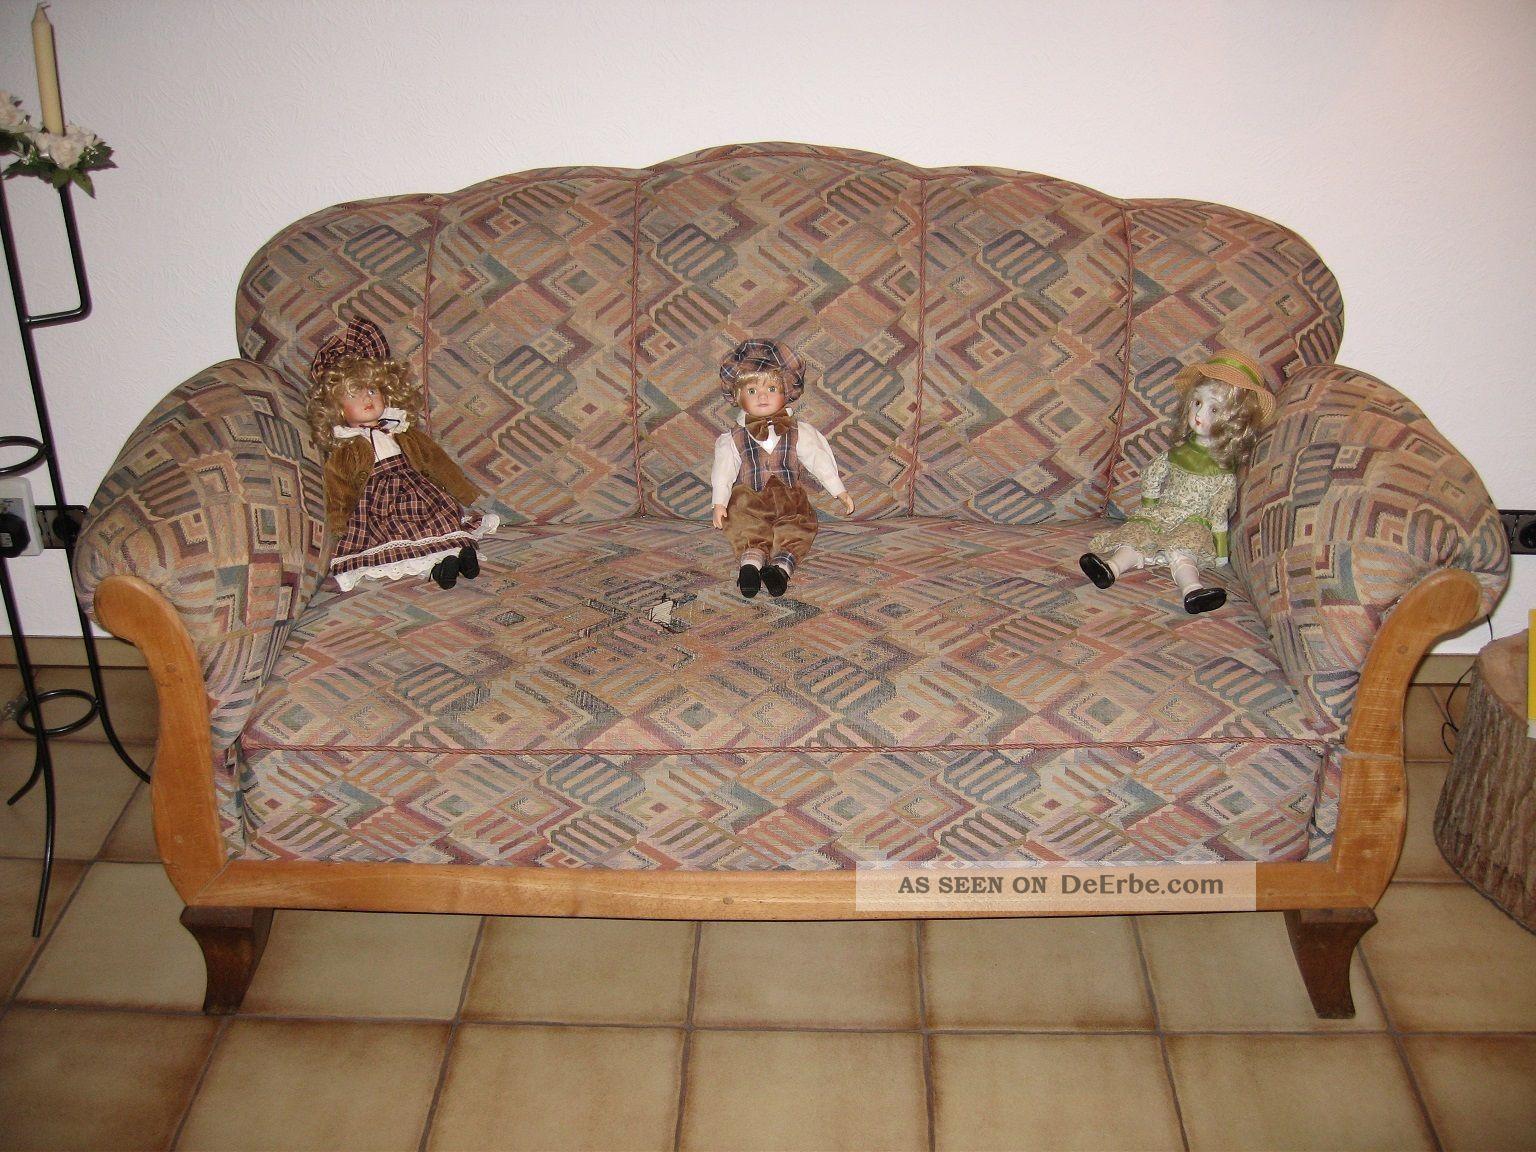 antikes sofa liegesofa holz stoff schlafsofa alt antik garnitur. Black Bedroom Furniture Sets. Home Design Ideas